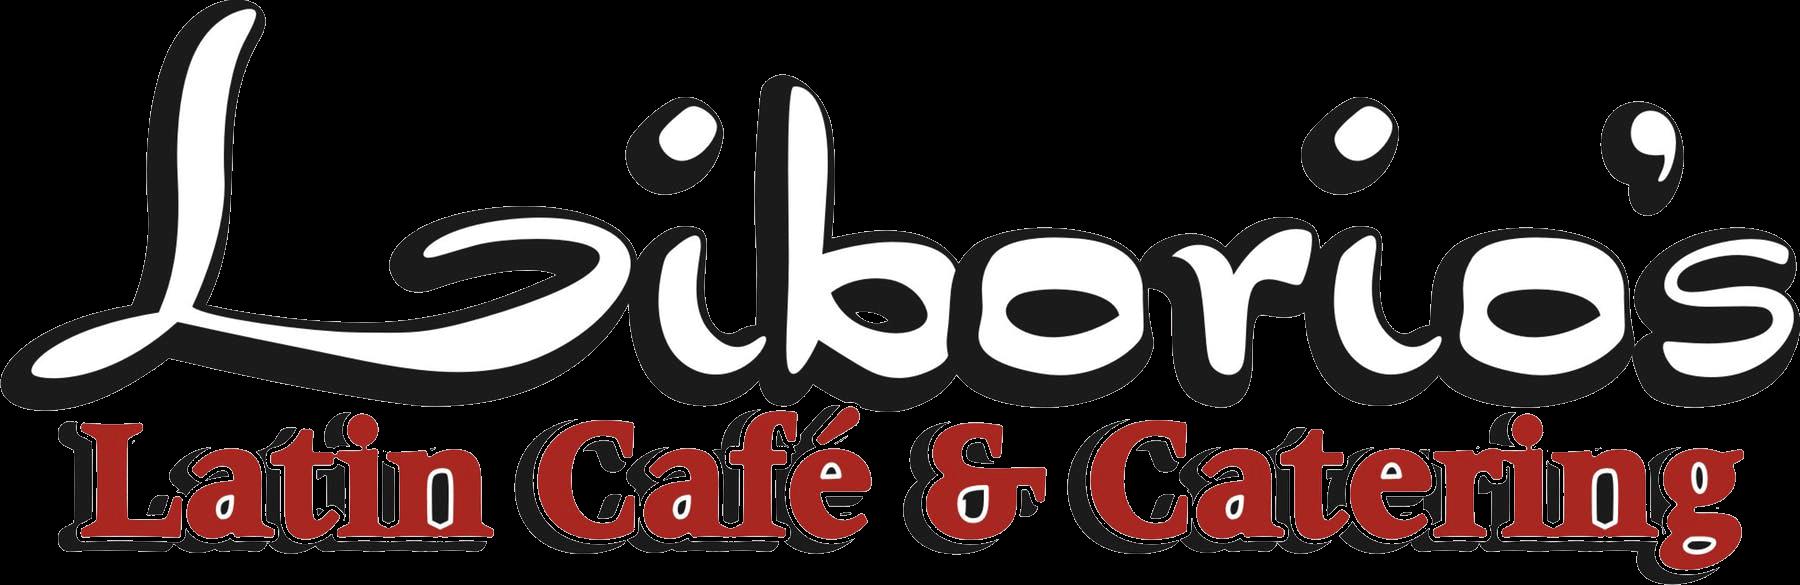 Liborio's Latin Cafe & Catering Home